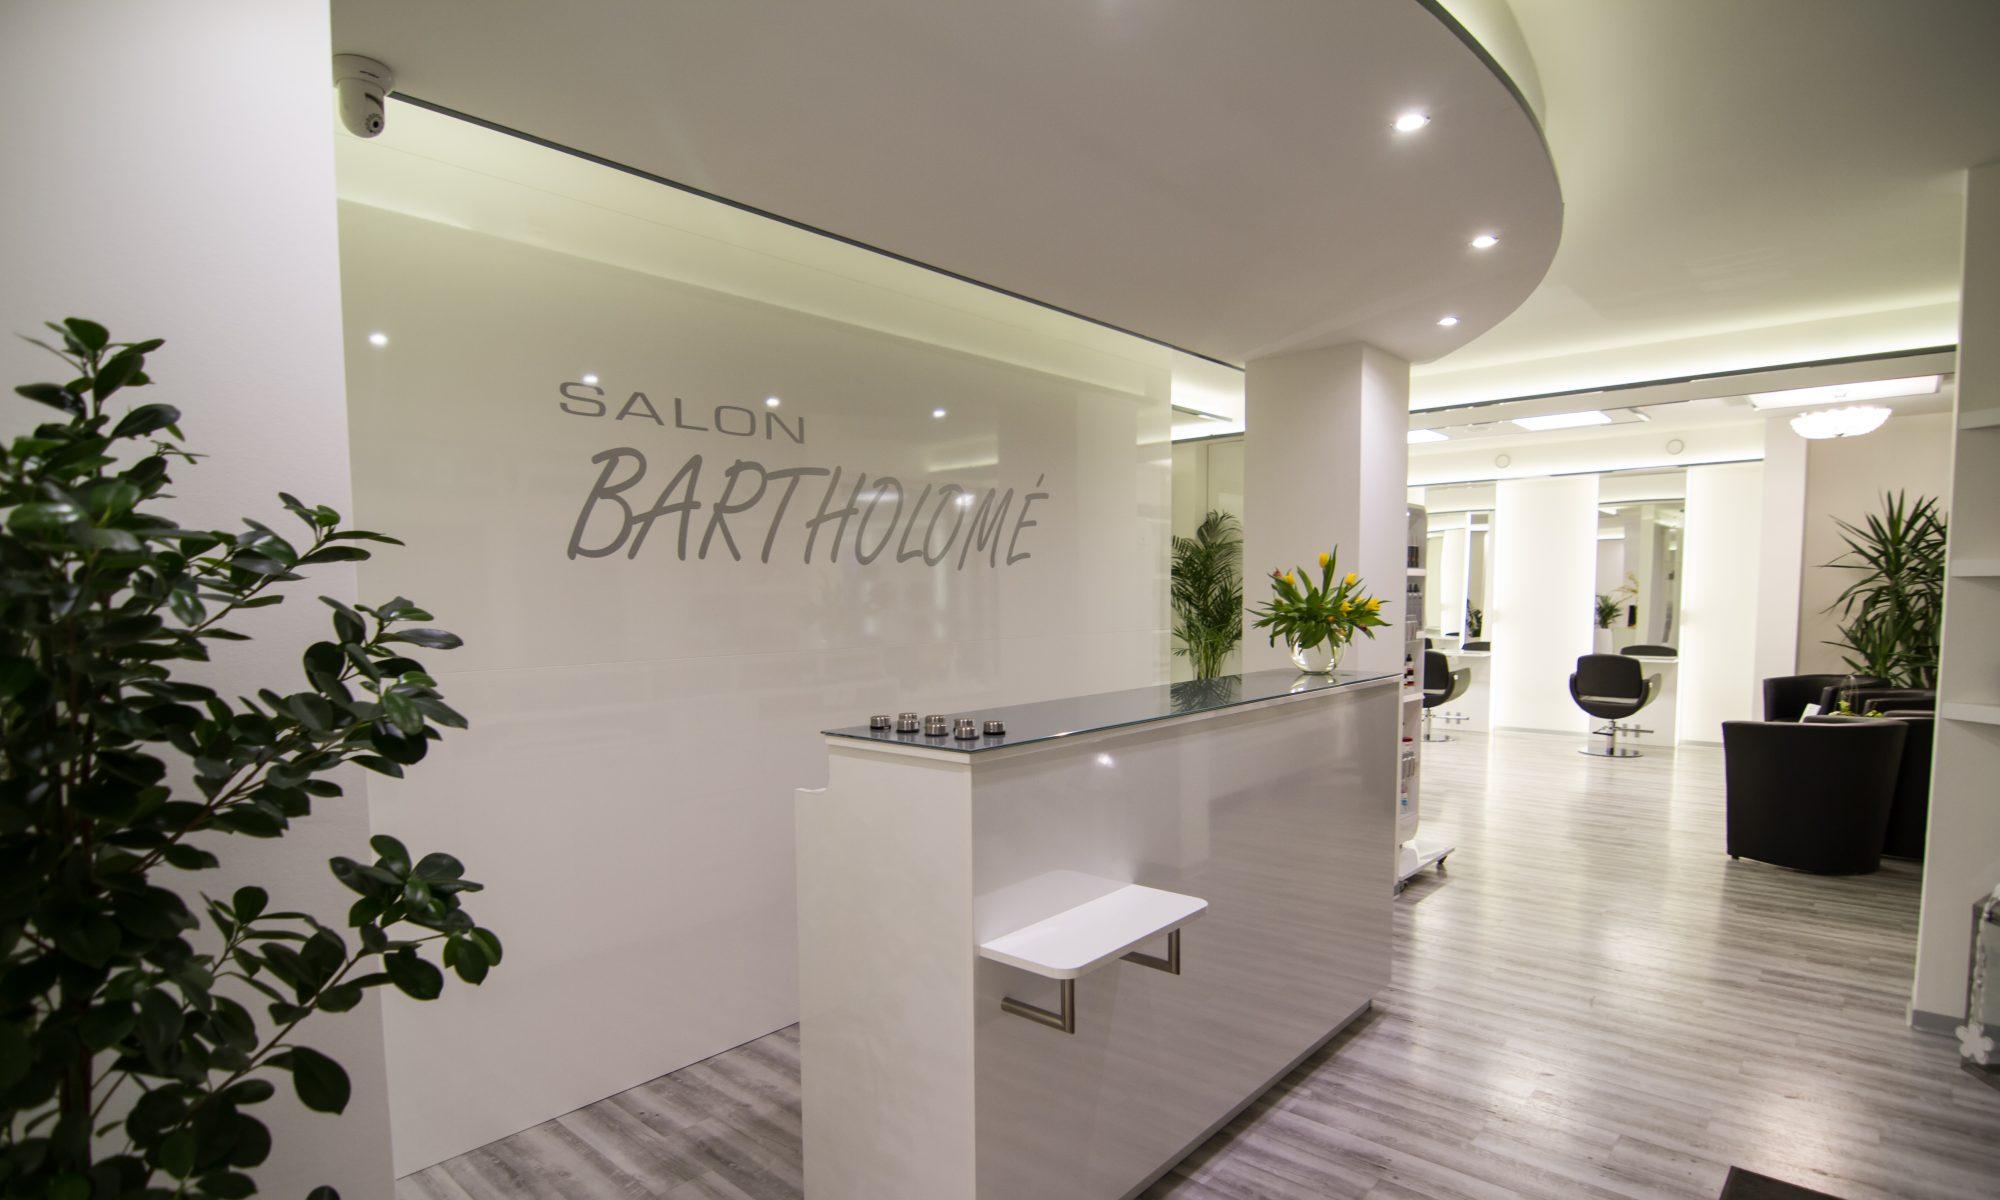 Salon Bartholomé